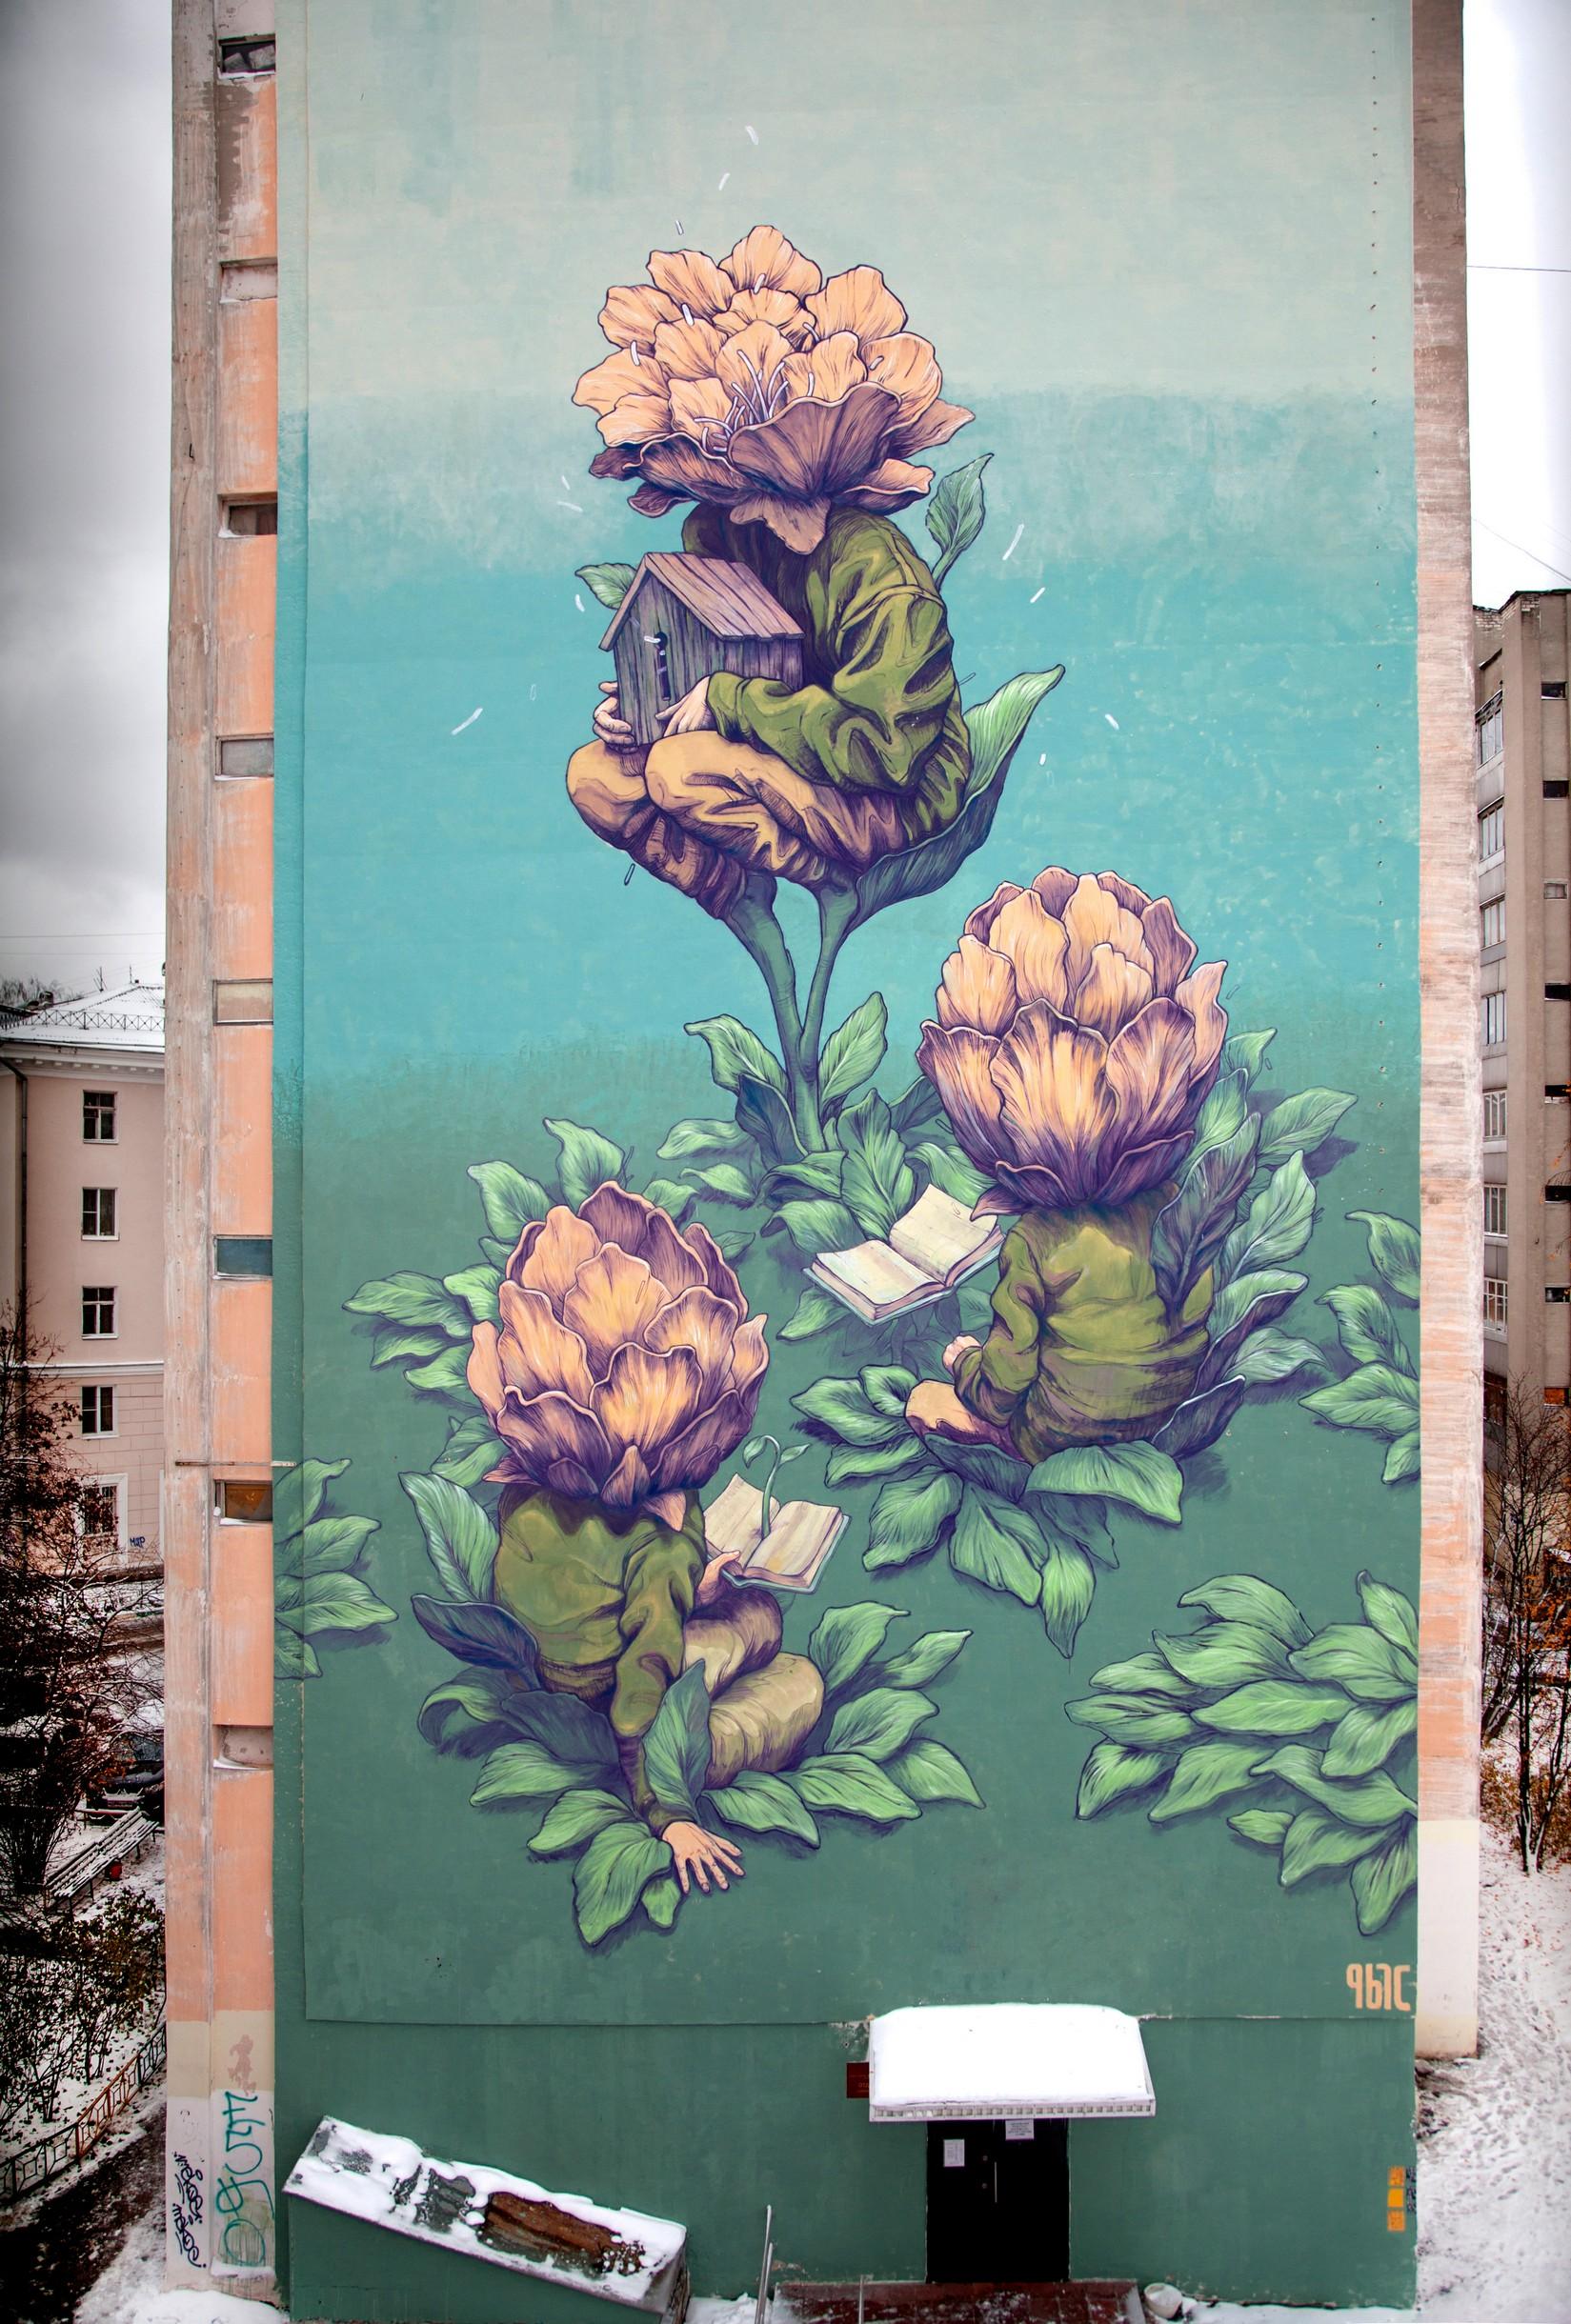 Fresque Murale Street Art Rustam Qbic 01 La Boite Verte